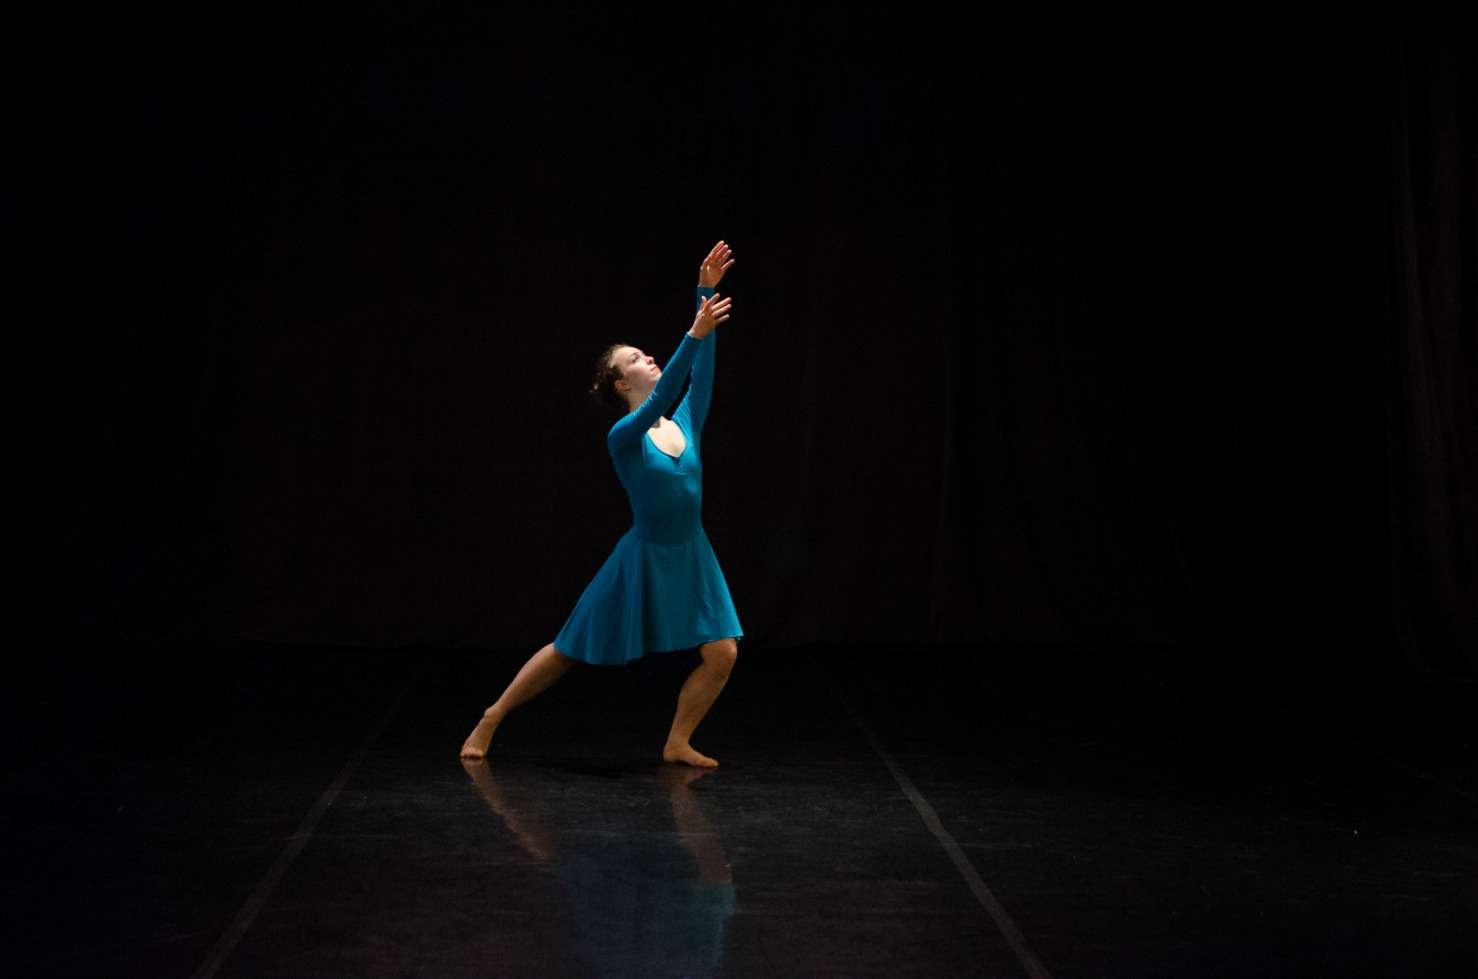 Fremont Danceworks Annual Concert performer